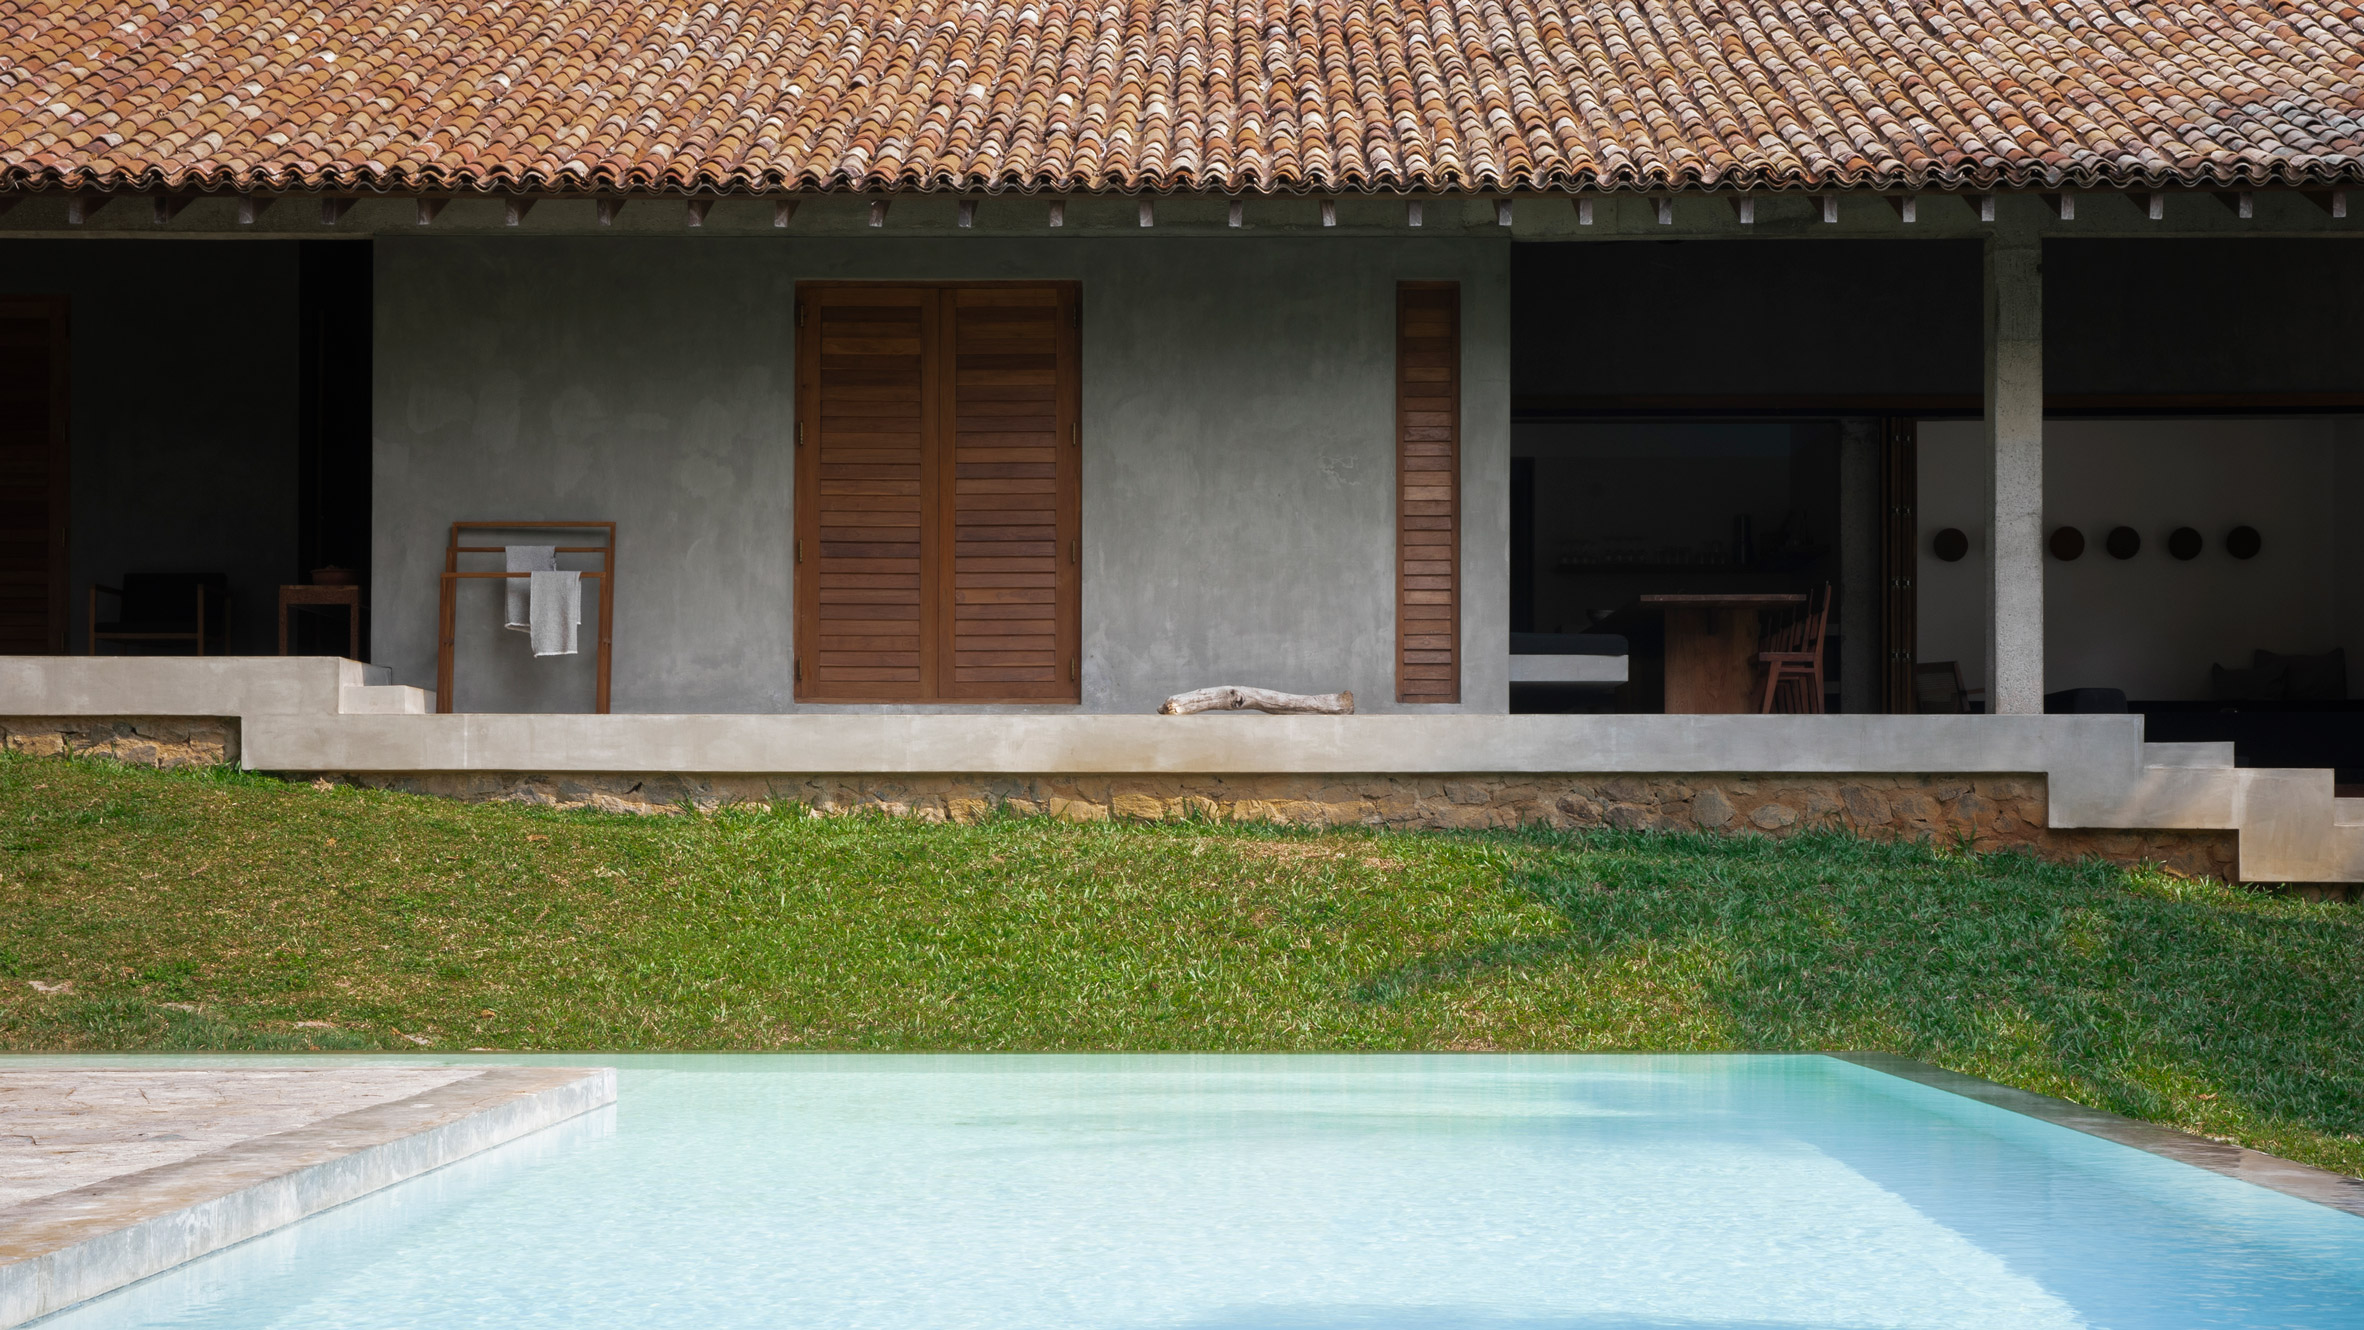 Concrete Surfaces Evoke Rough Luxury Inside Sri Lanka S K House